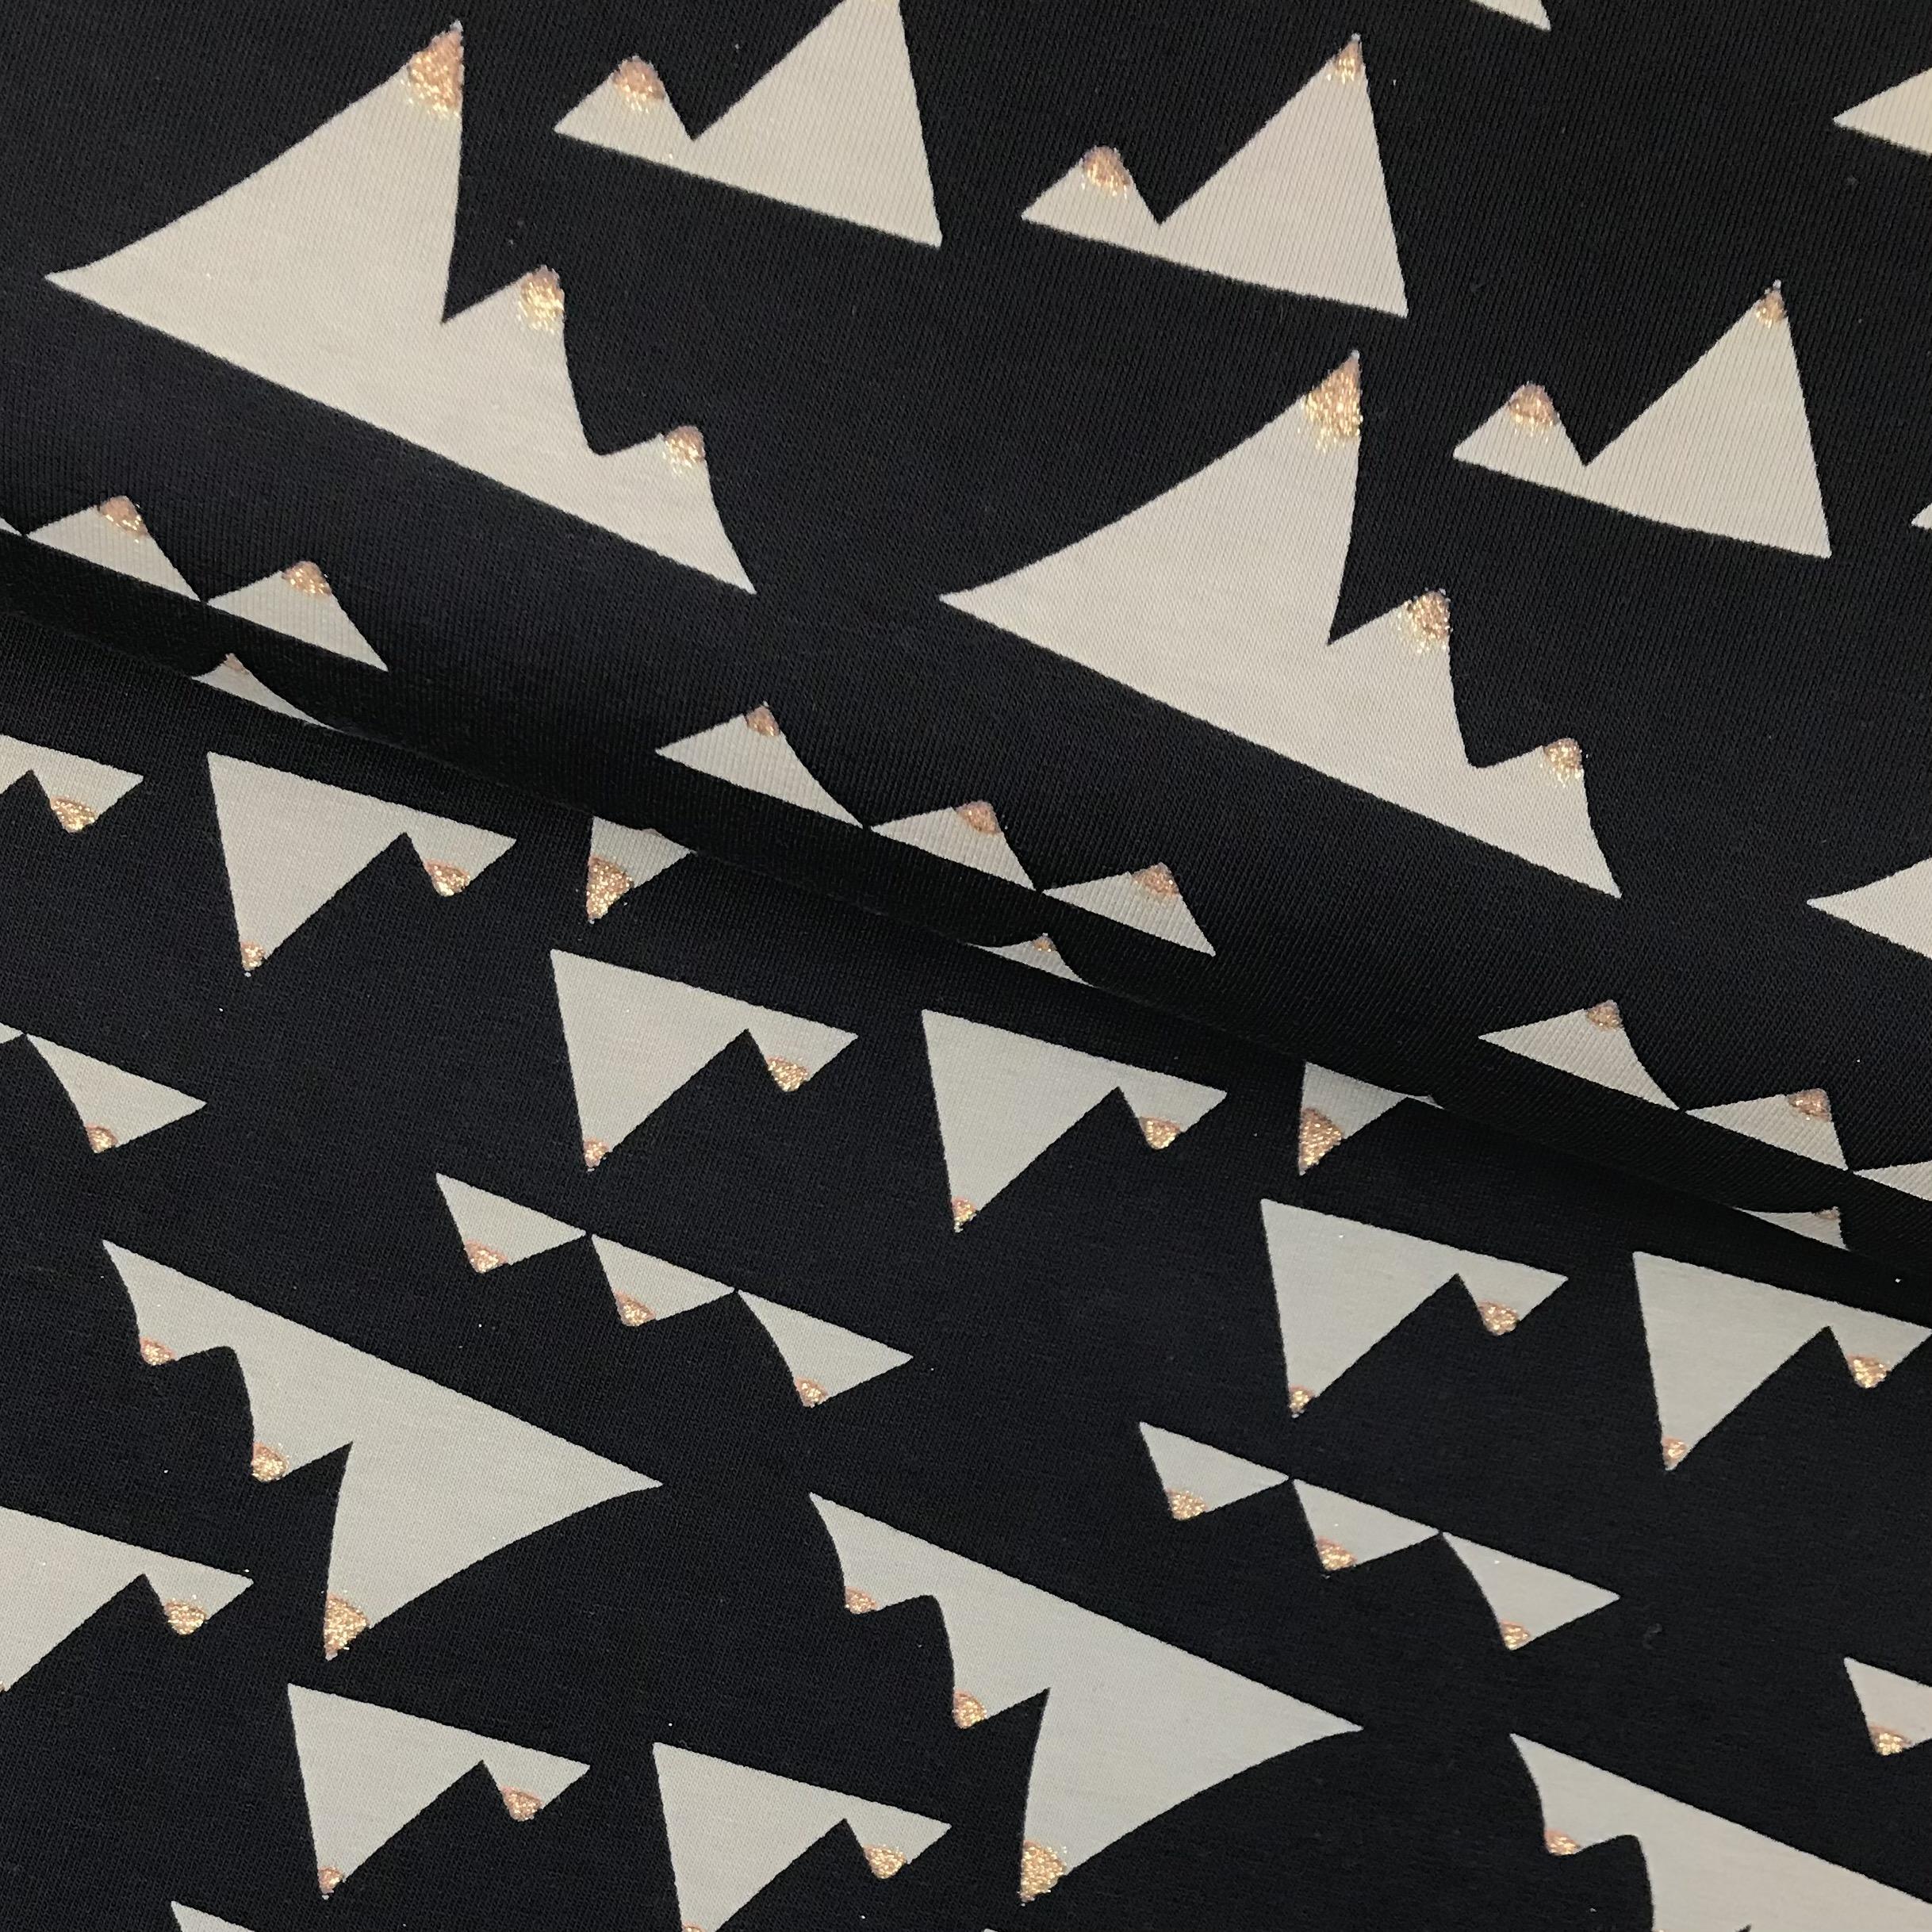 Kuschelsweat /Joggingstoff, angeraut, schwarz. Art.SW11181